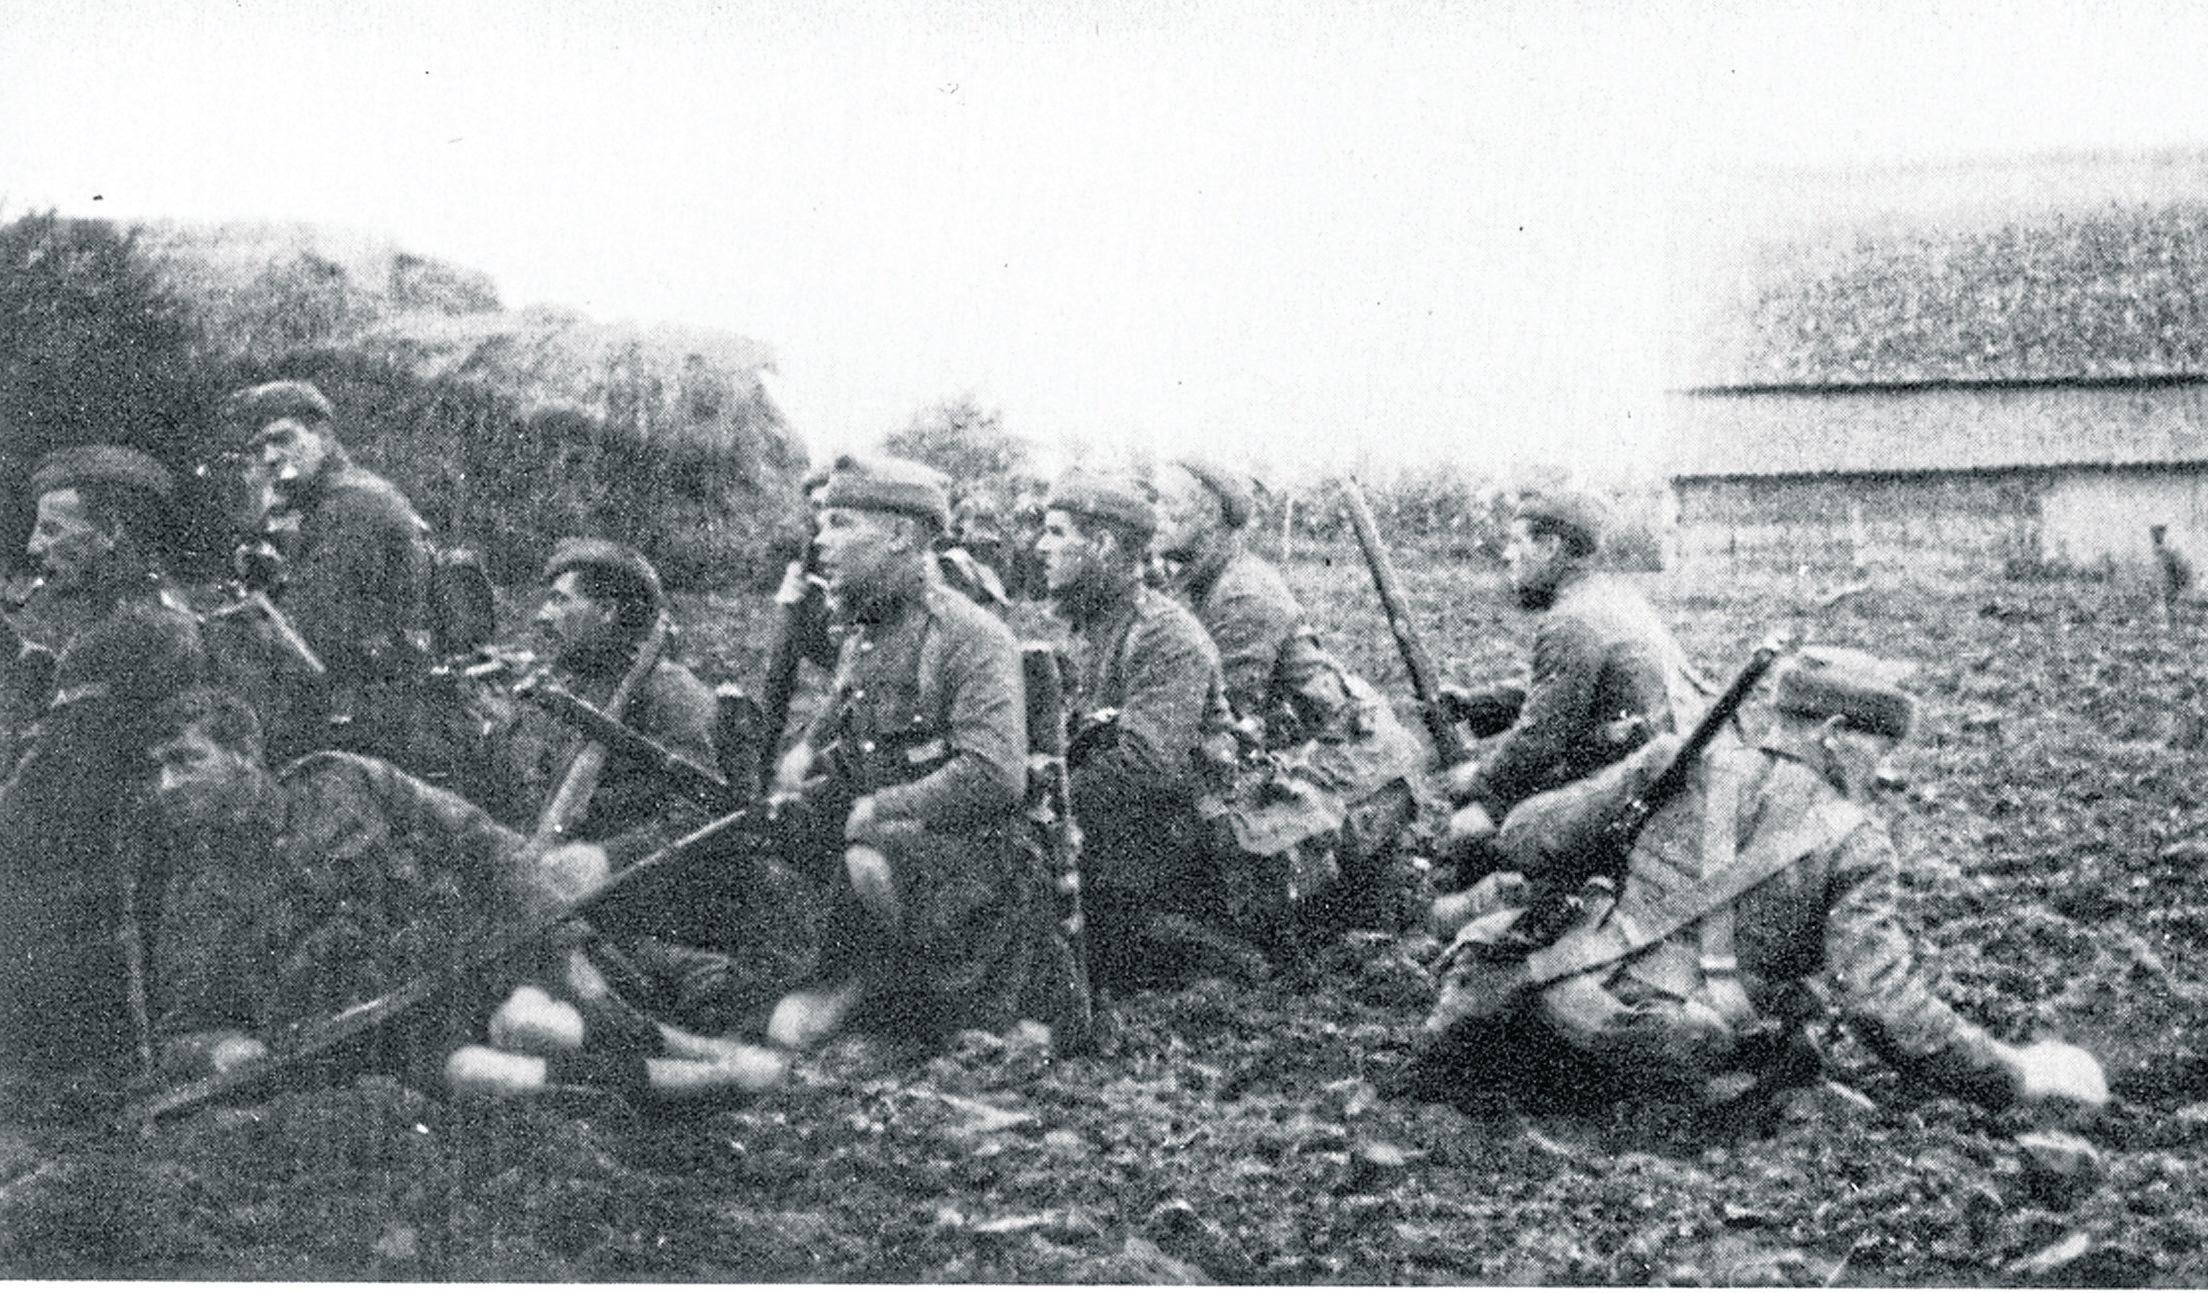 Gordon Highlanders wait on the edge of a field near Ypres